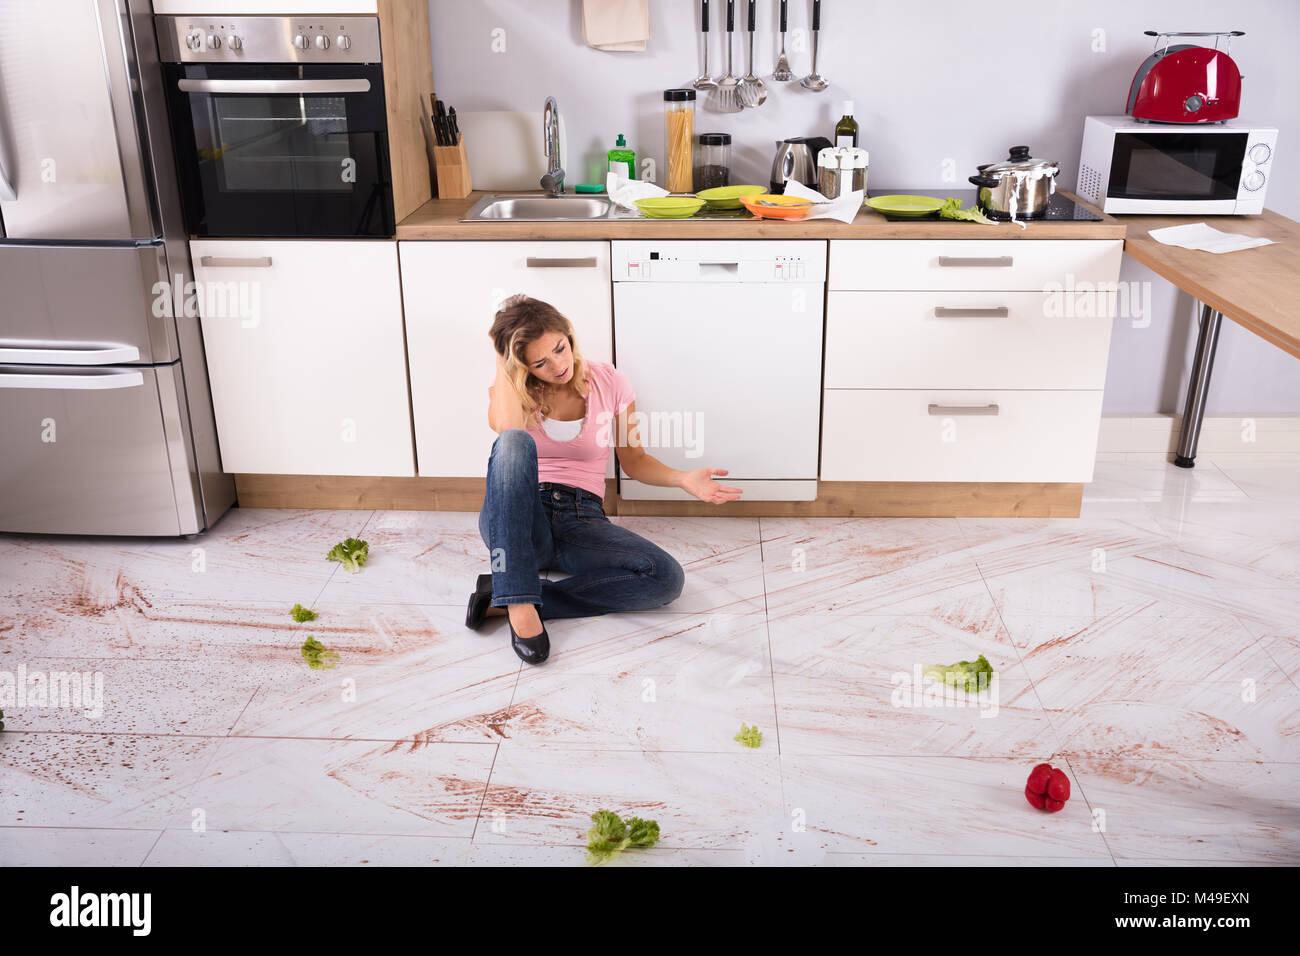 Dirty Kitchen Floor Hot Girl Hd Wallpaper